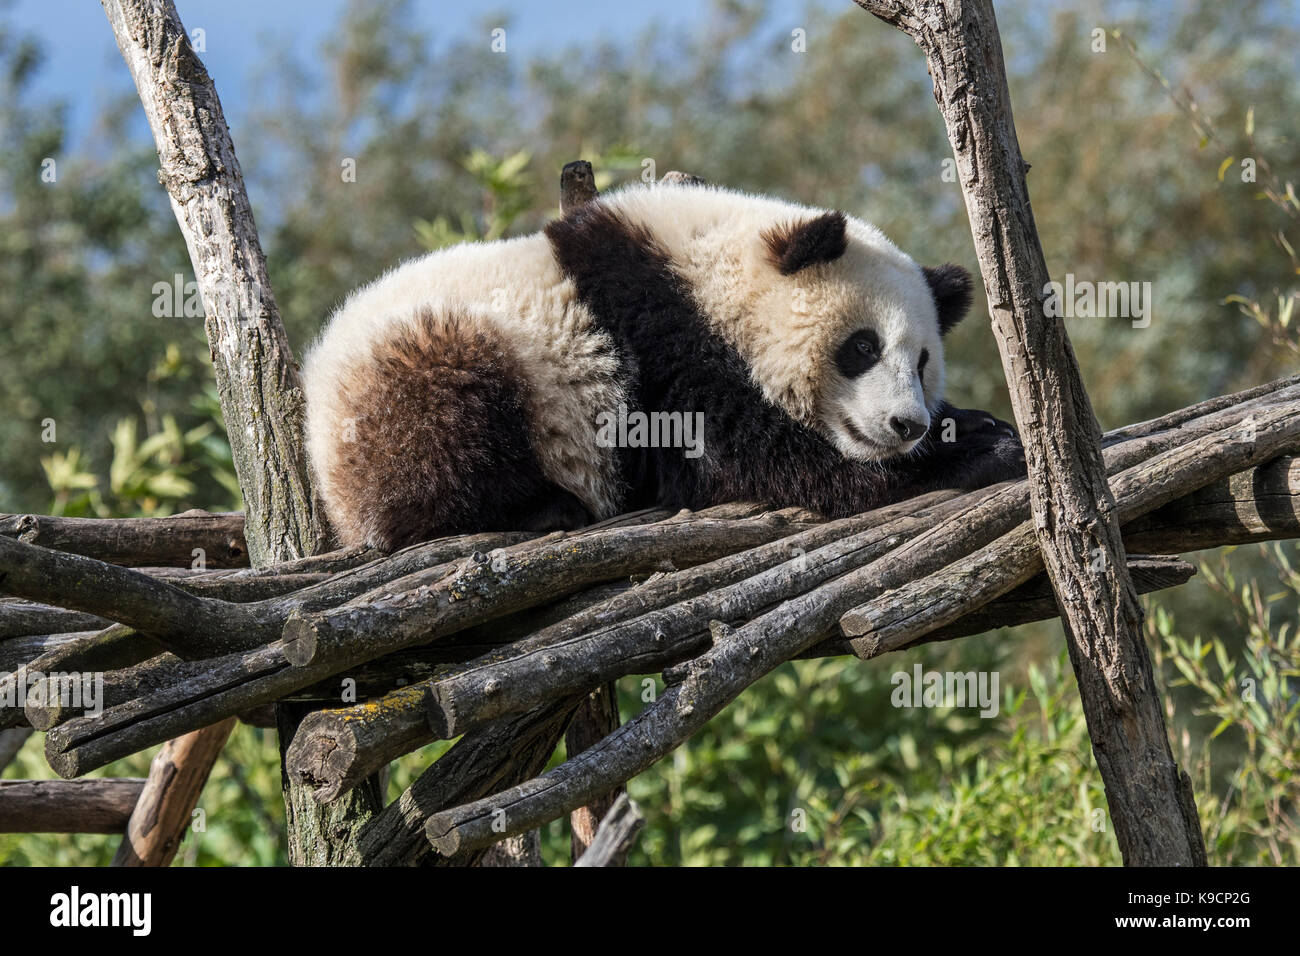 Giant panda (Ailuropoda melanoleuca) one-year old cub sleeping on wooden platform in zoo - Stock Image